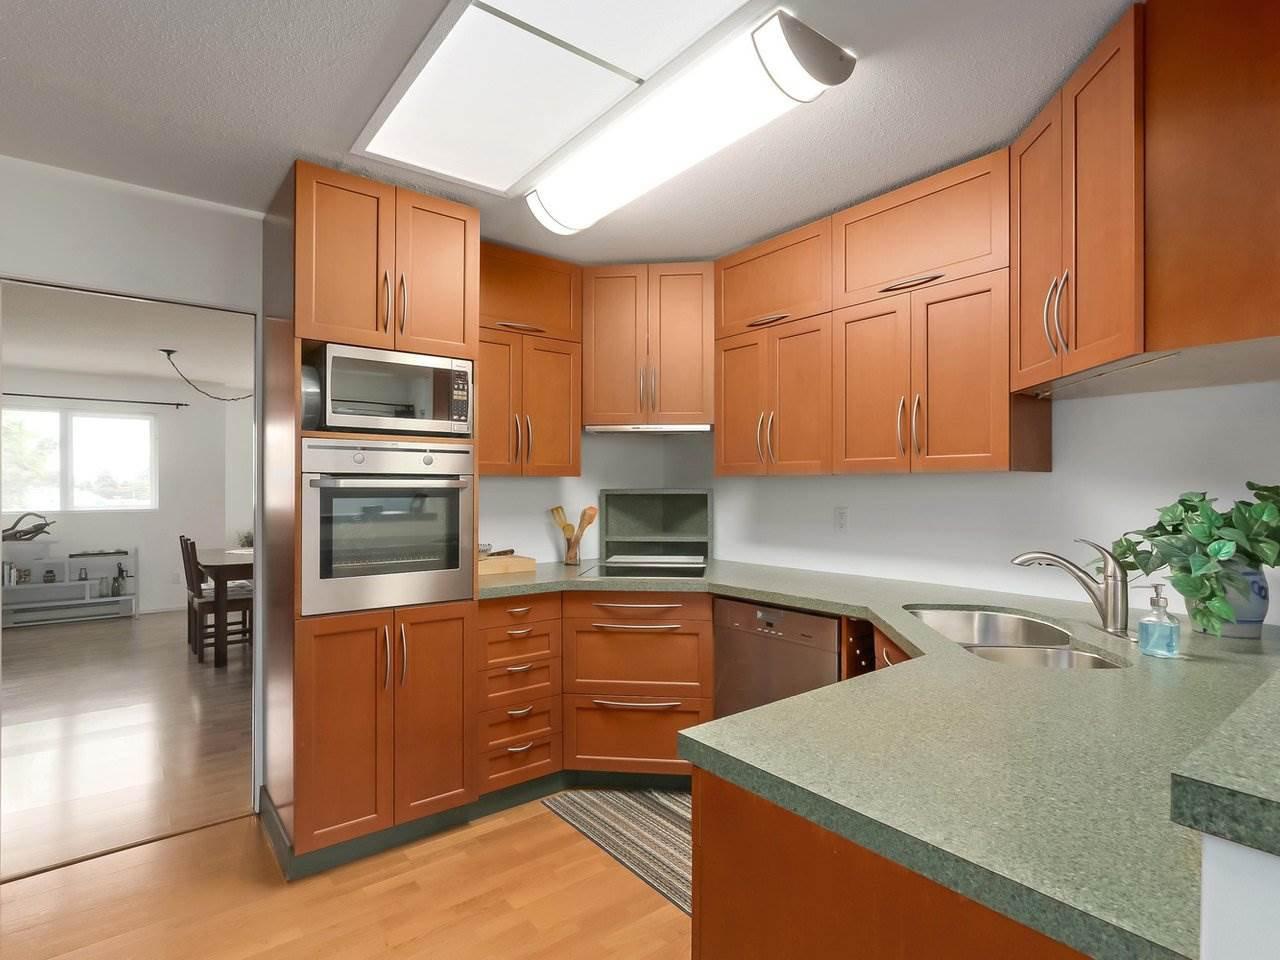 Photo 8: Photos: 311 4989 47 AVENUE in Delta: Ladner Elementary Condo for sale (Ladner)  : MLS®# R2421936